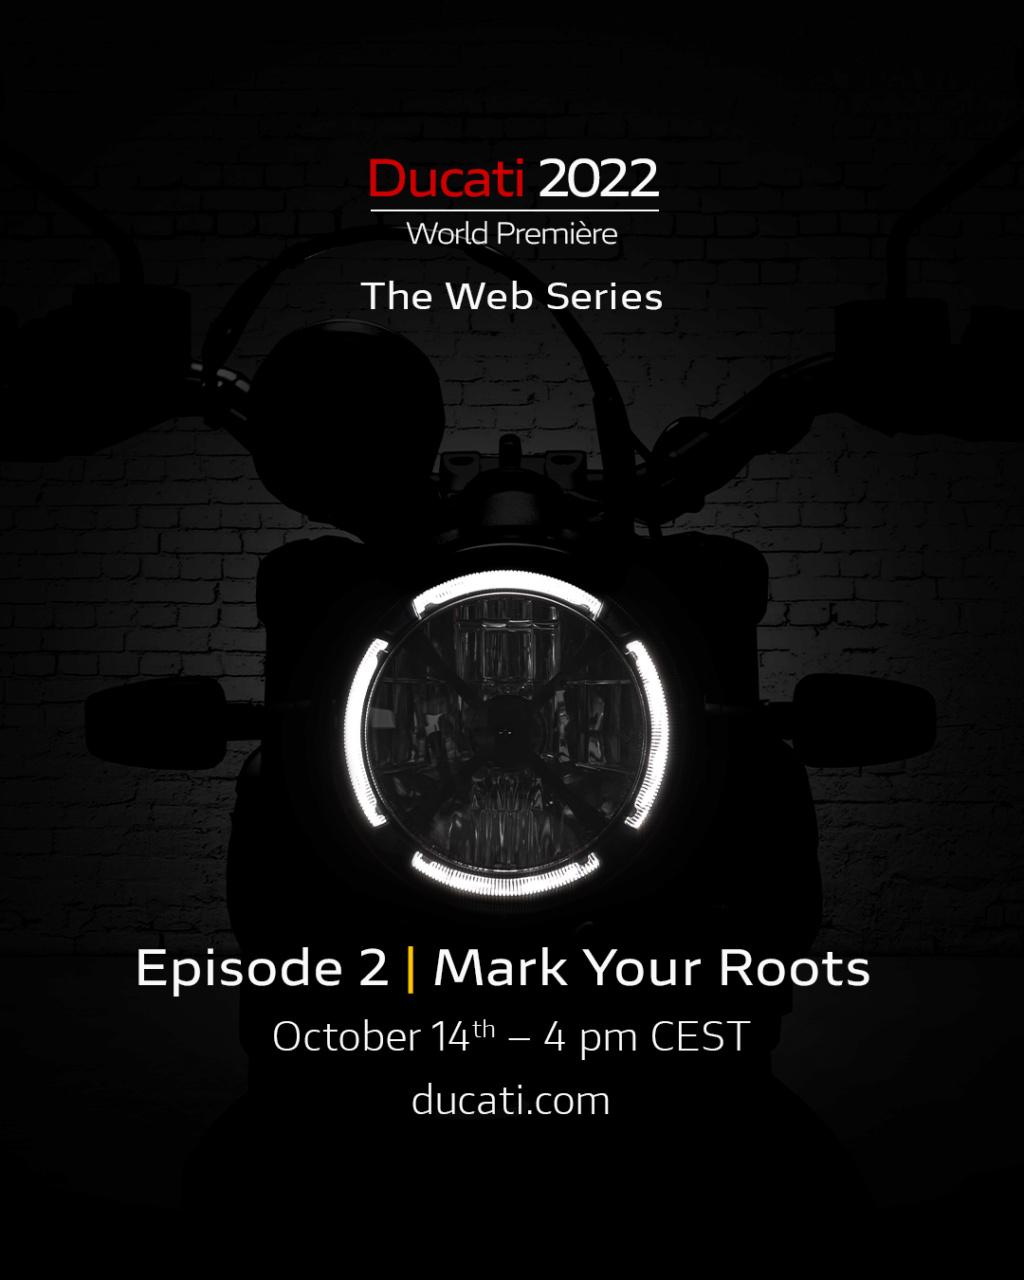 Ducati World Première 2022 Dwp22-11